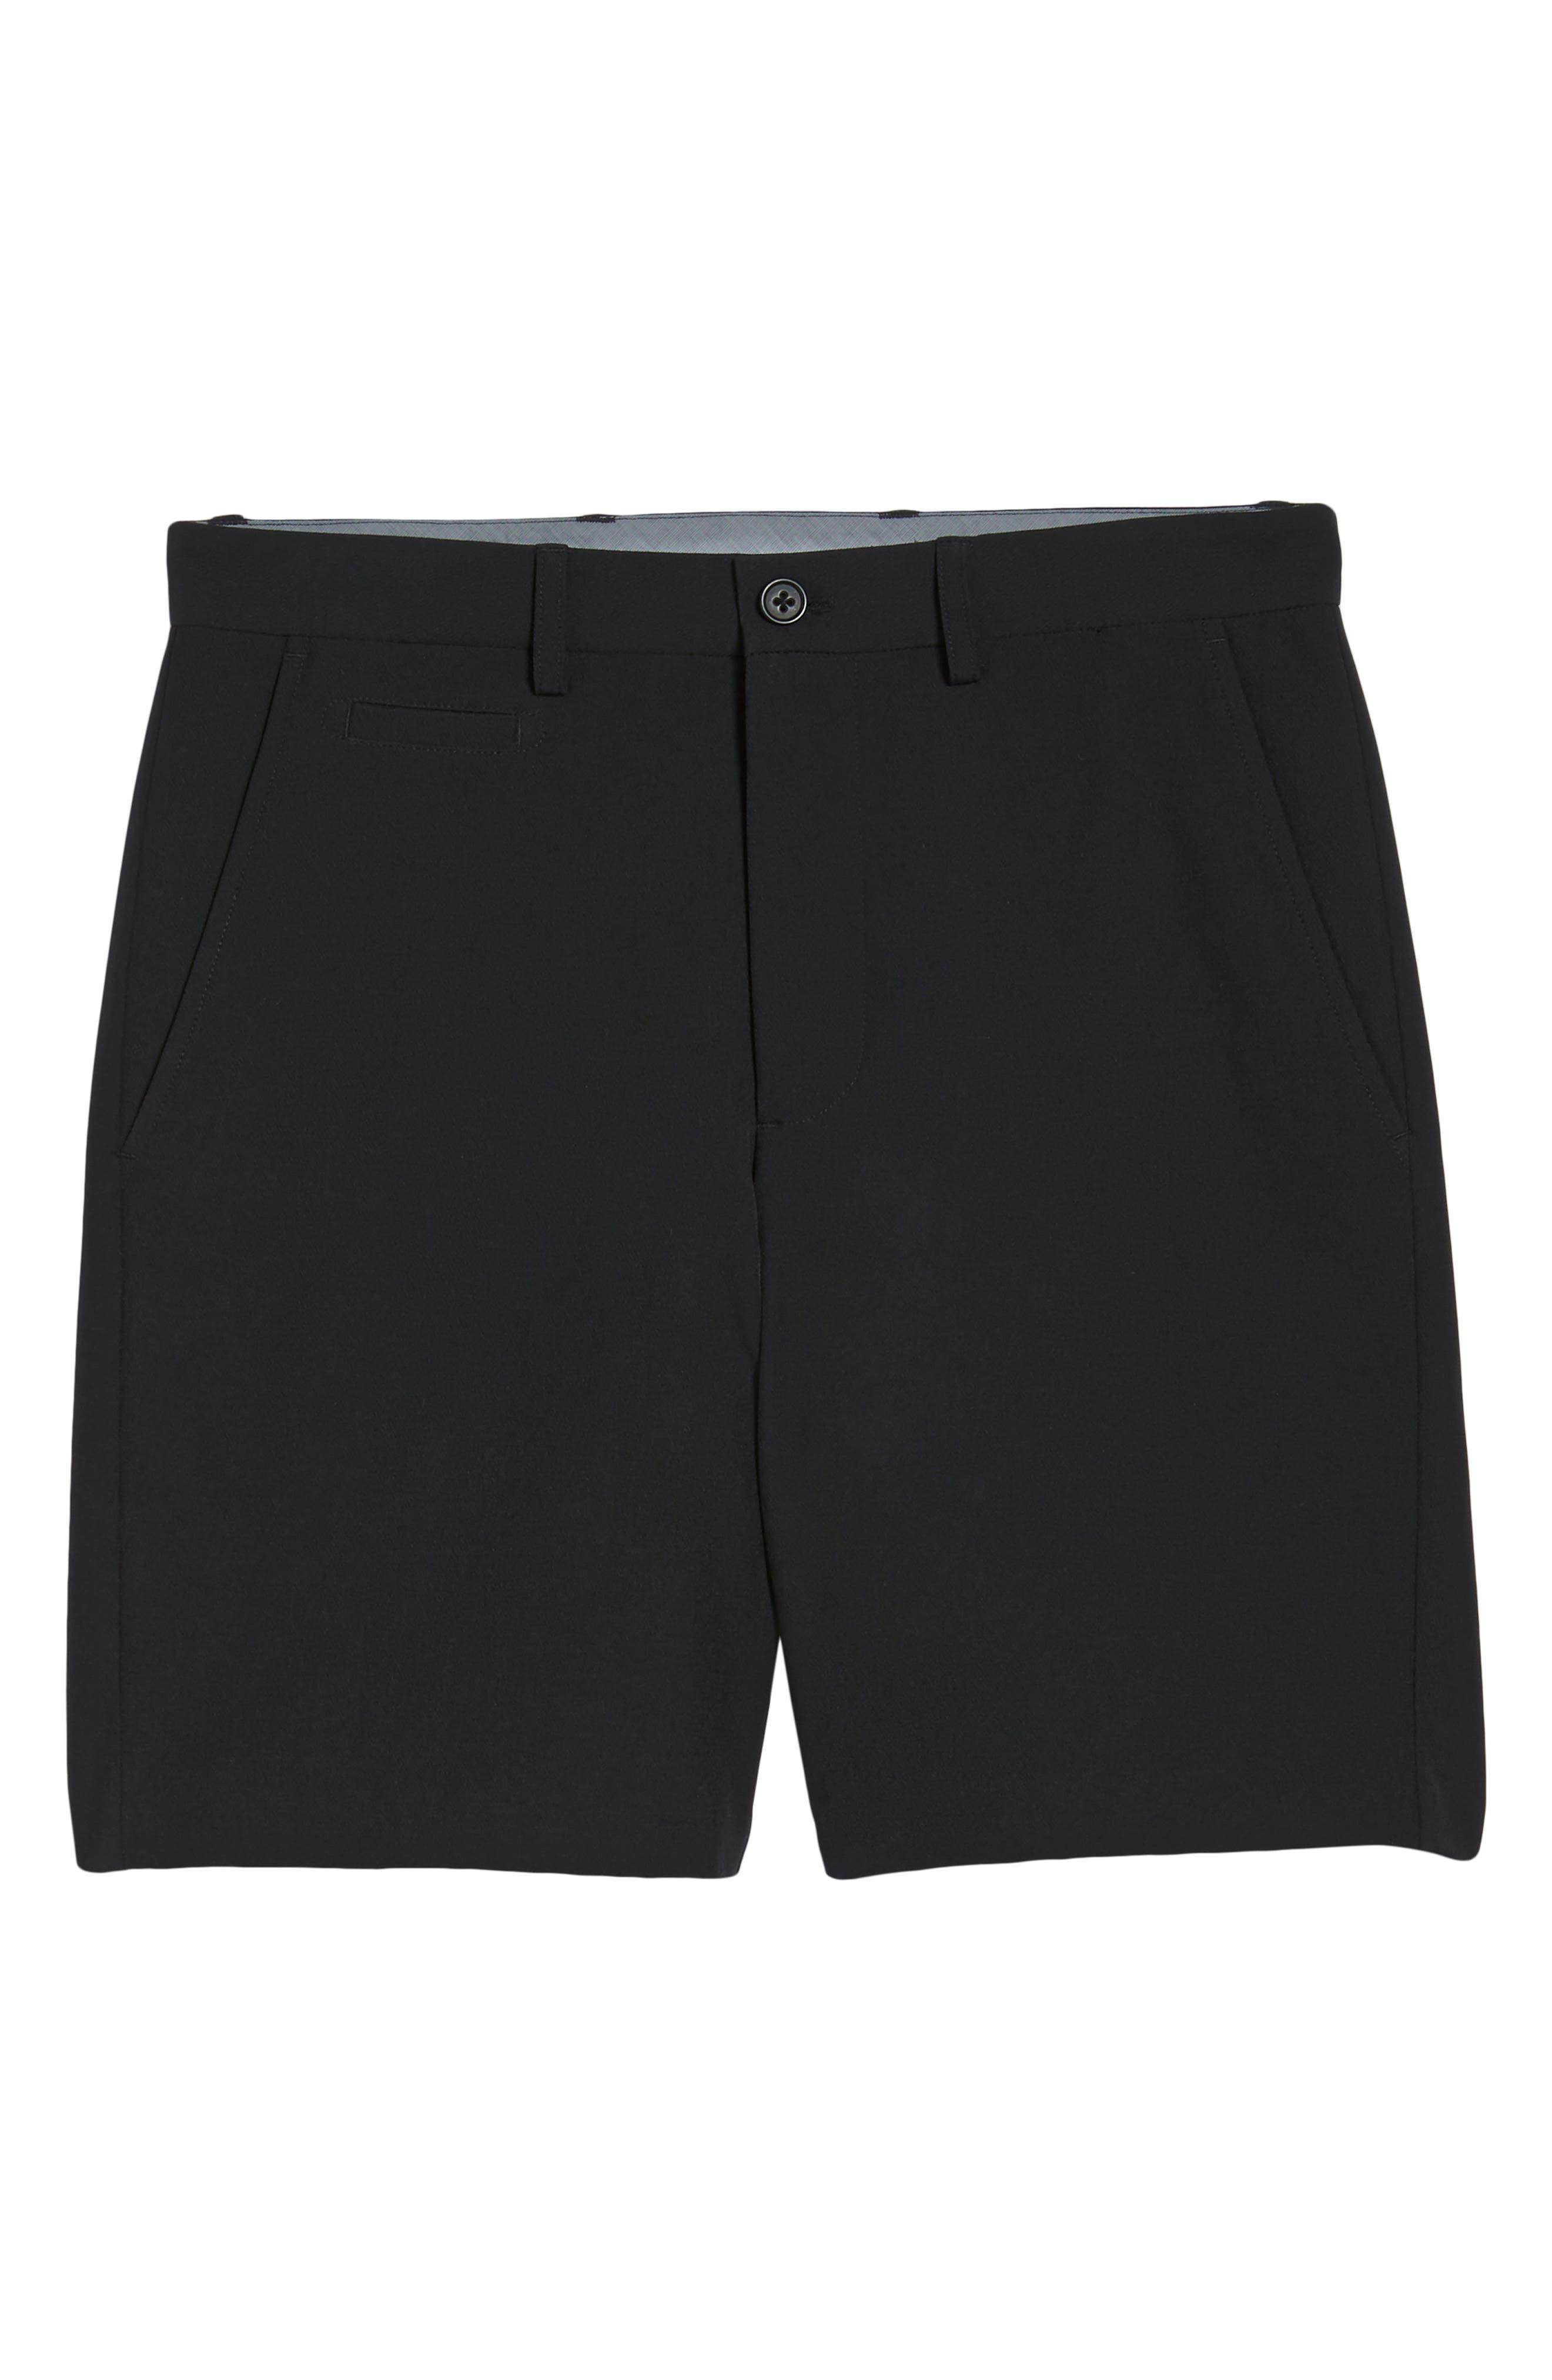 Performance Chino Shorts,                             Alternate thumbnail 6, color,                             001